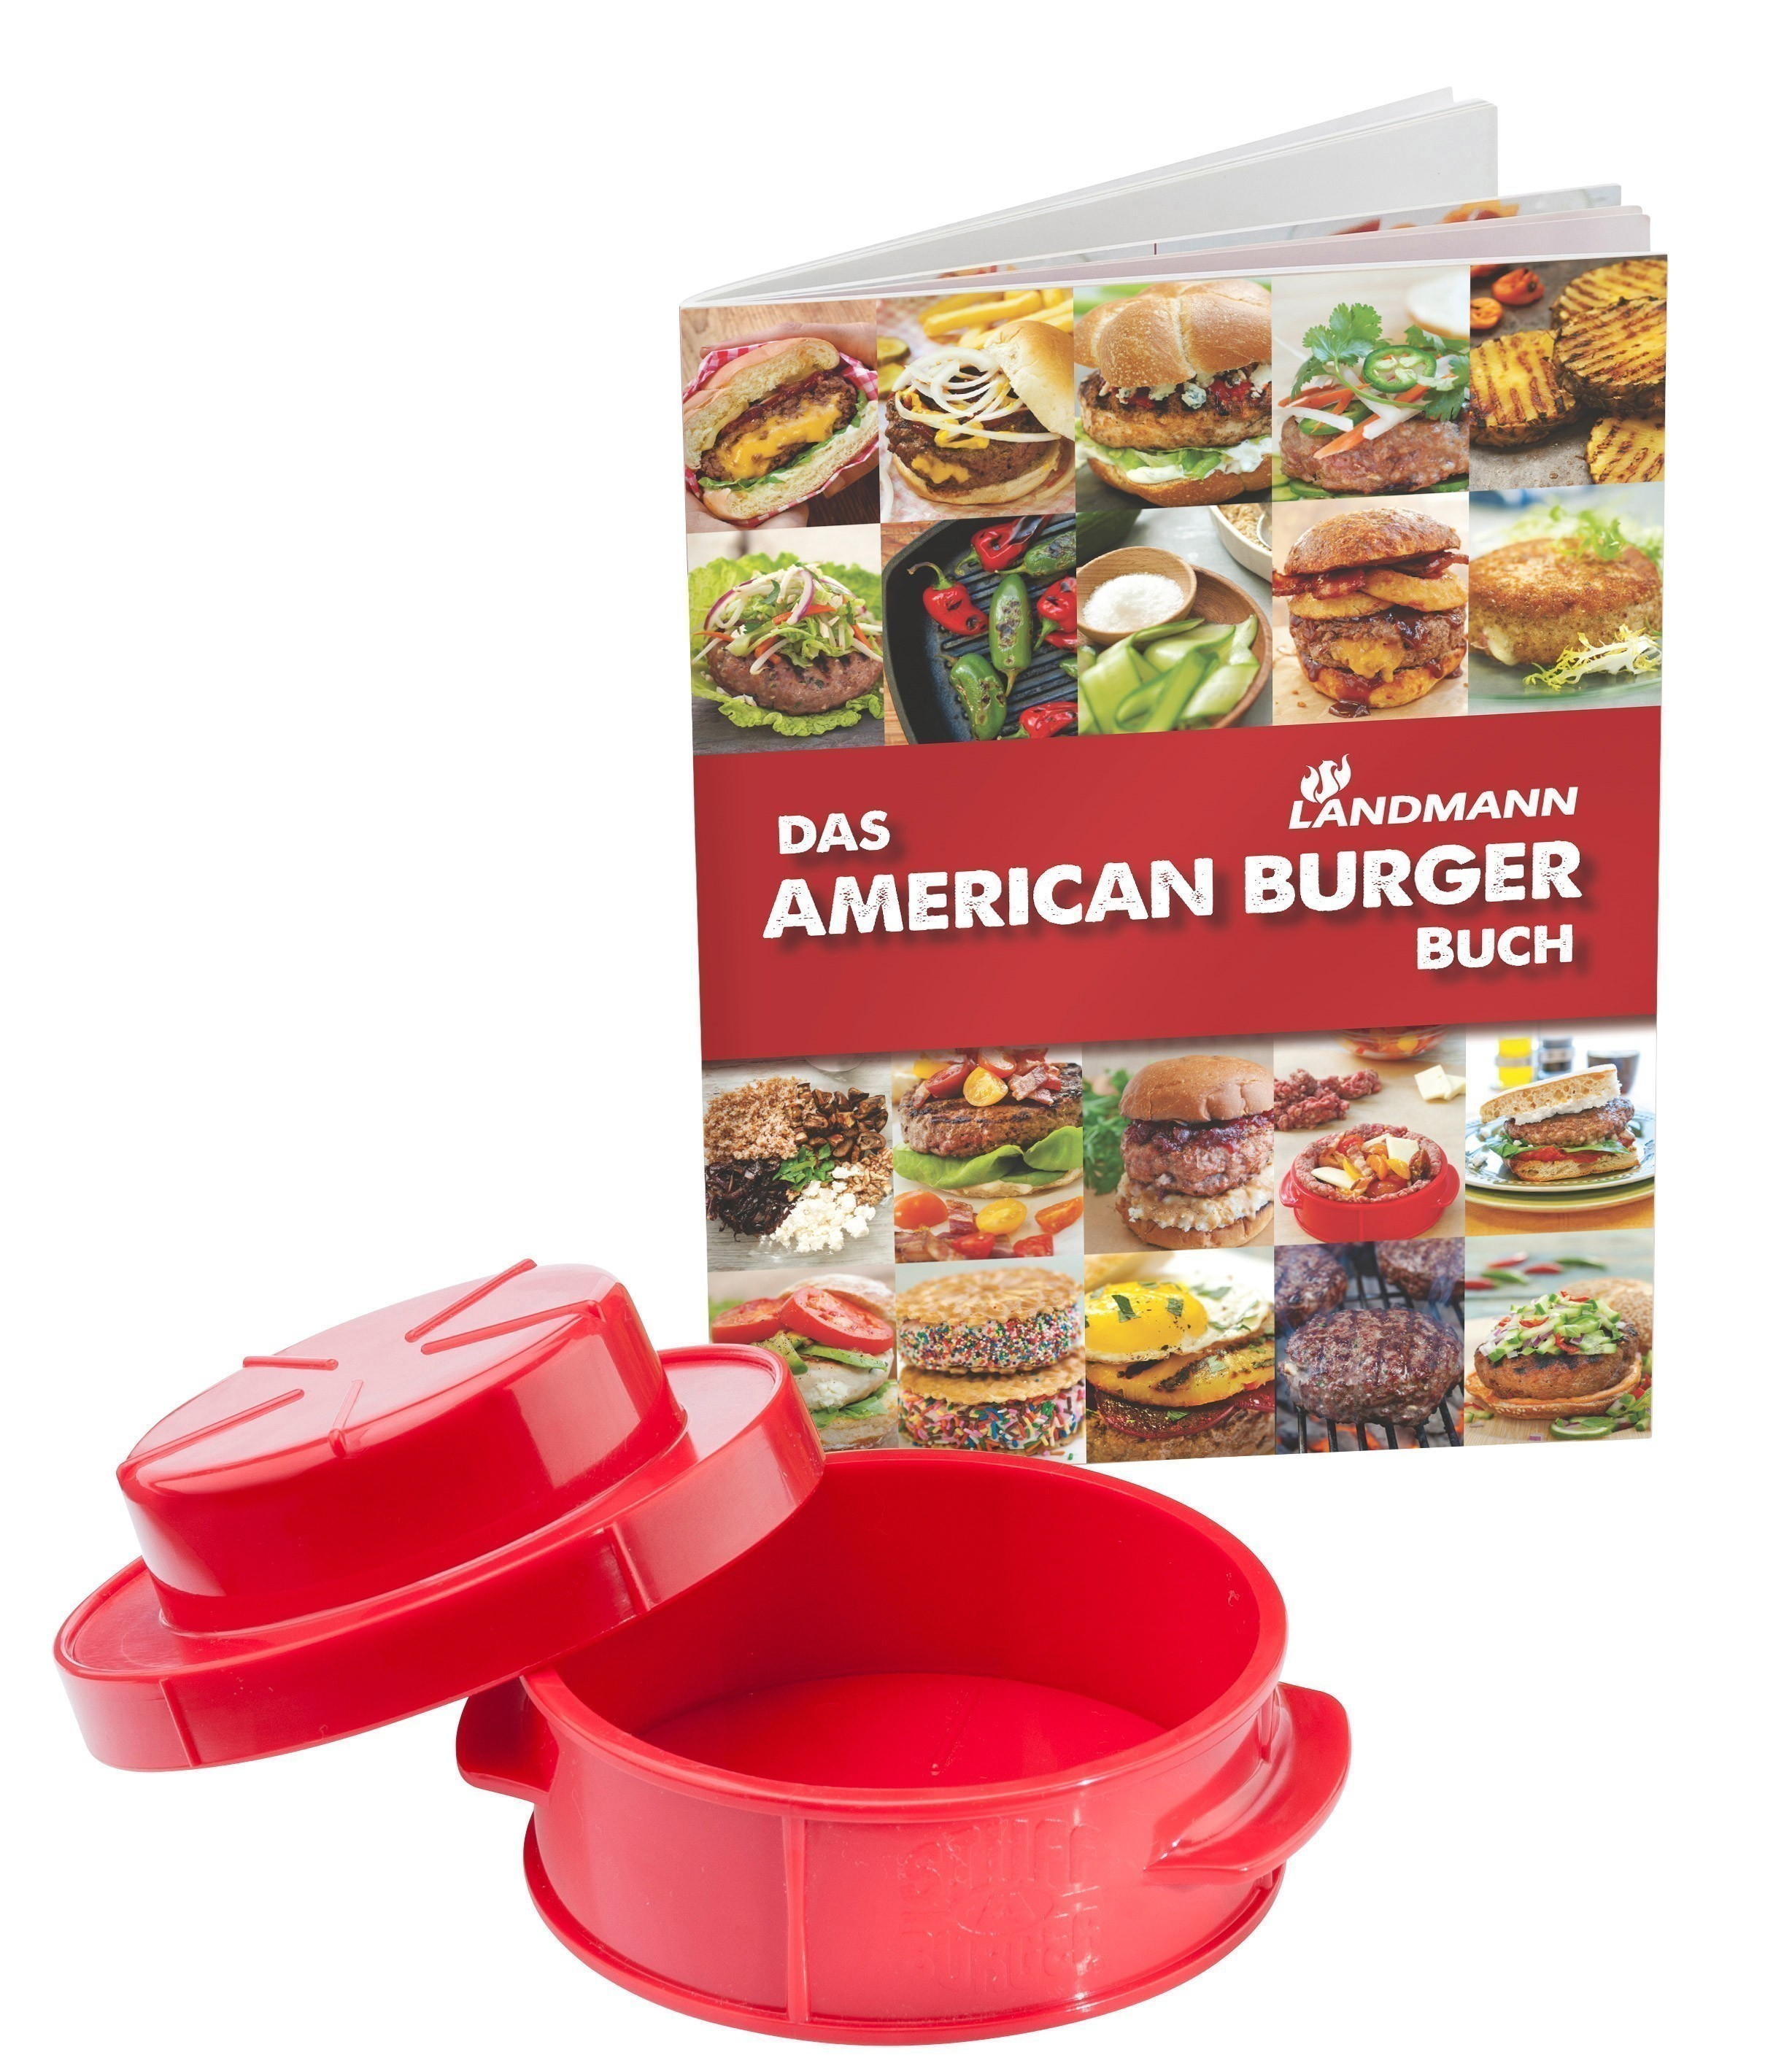 Landmann American Burger Set / Hamburgerpresse mit Rezeptbuch 13709 Bild 1